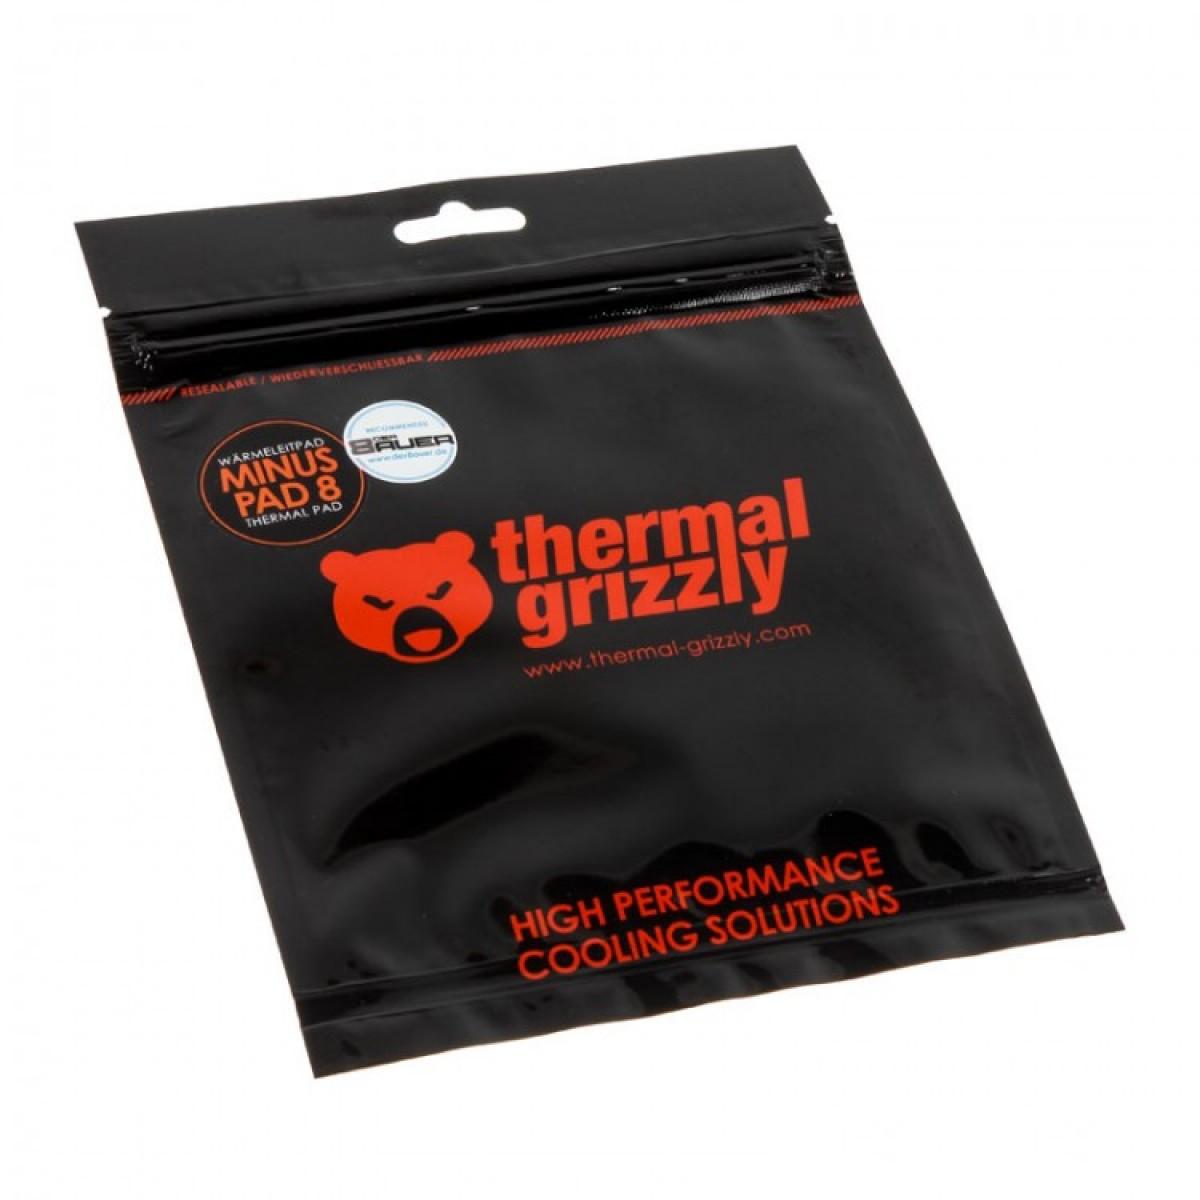 Pad Térmico Thermal Grizzly Minus Pad 8, 120 x 20 x 1 mm, TG-MP8-120-20-10-1R